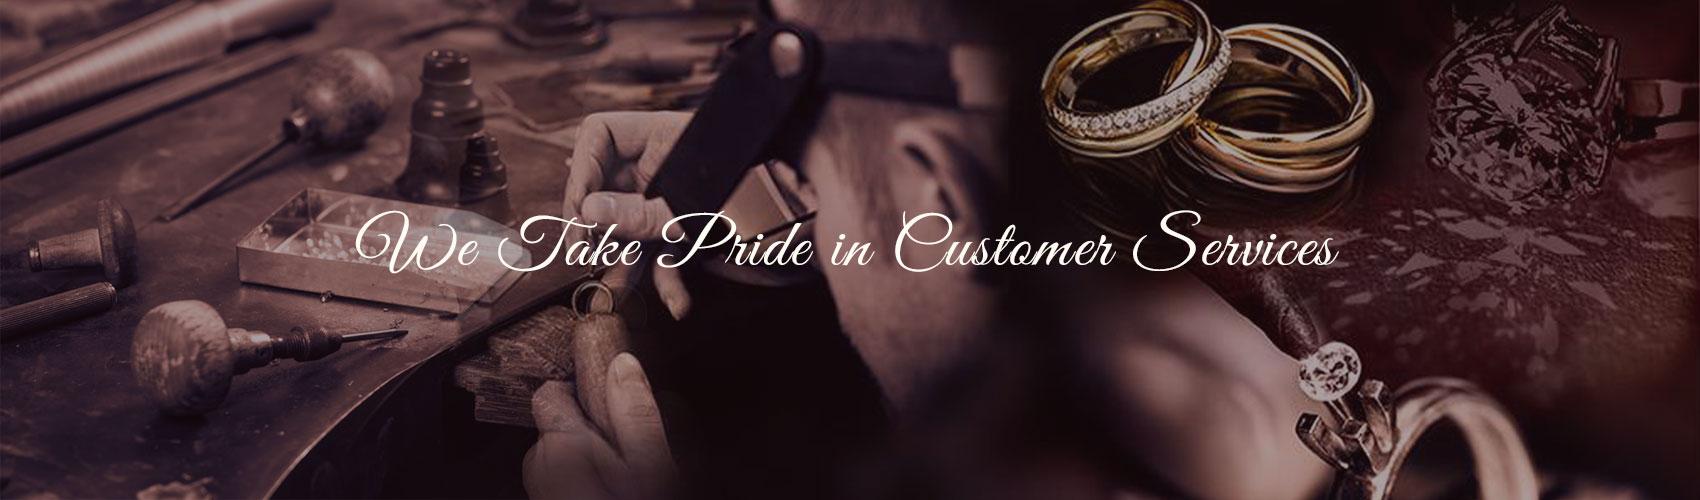 Dana Point Jewelers Serices